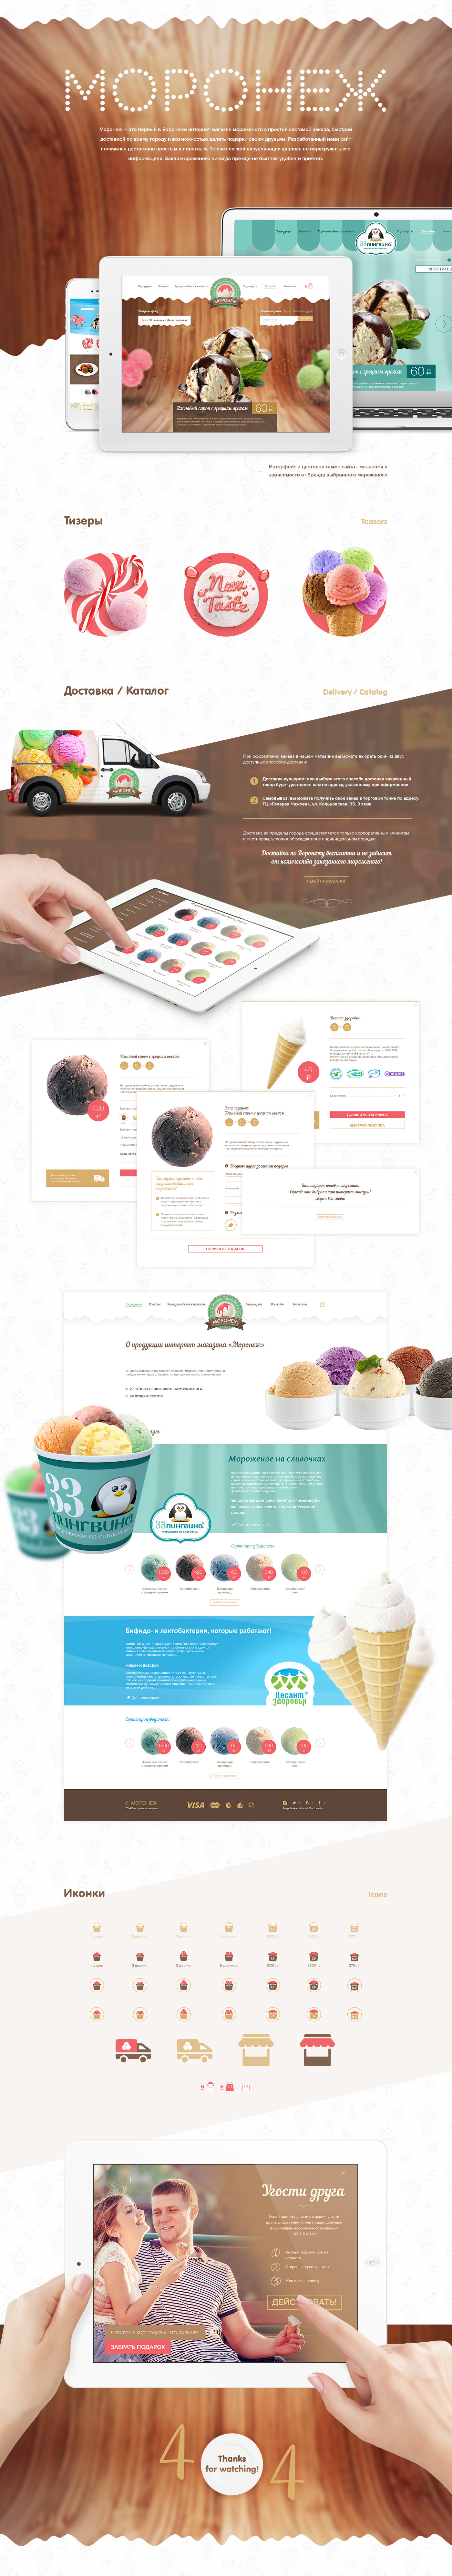 shop,Online shop,ice cream,moronezh